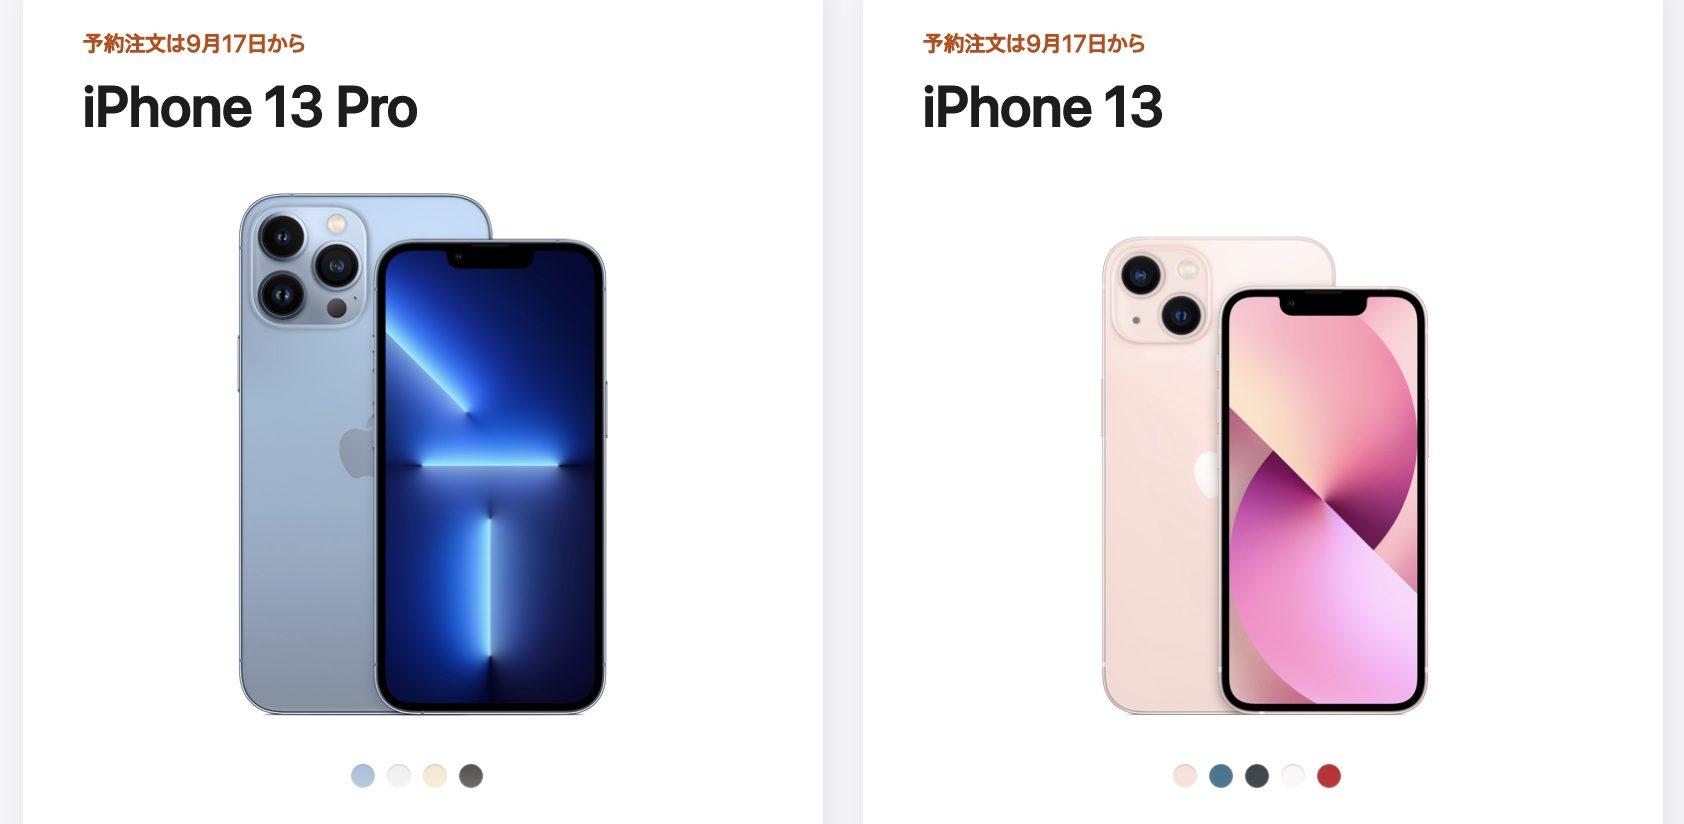 iPhone13とiPhone13 Pro